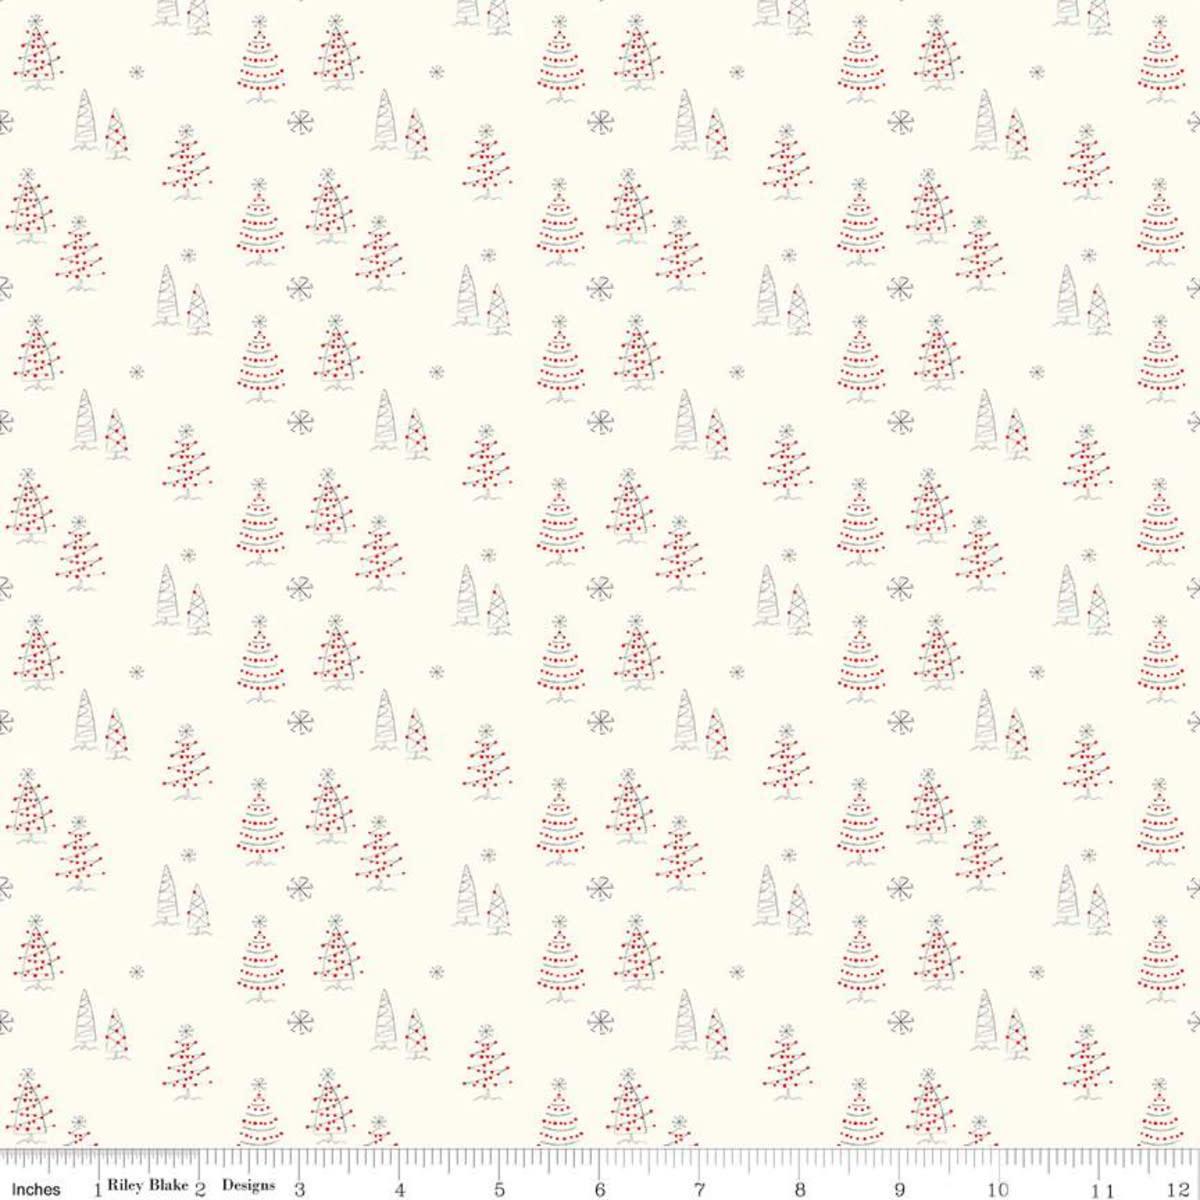 RILEY BLAKE DESIGNS MERRY LITTLE CHRISTMAS, TREES, CREAM $0.20 /CM OR $20/M